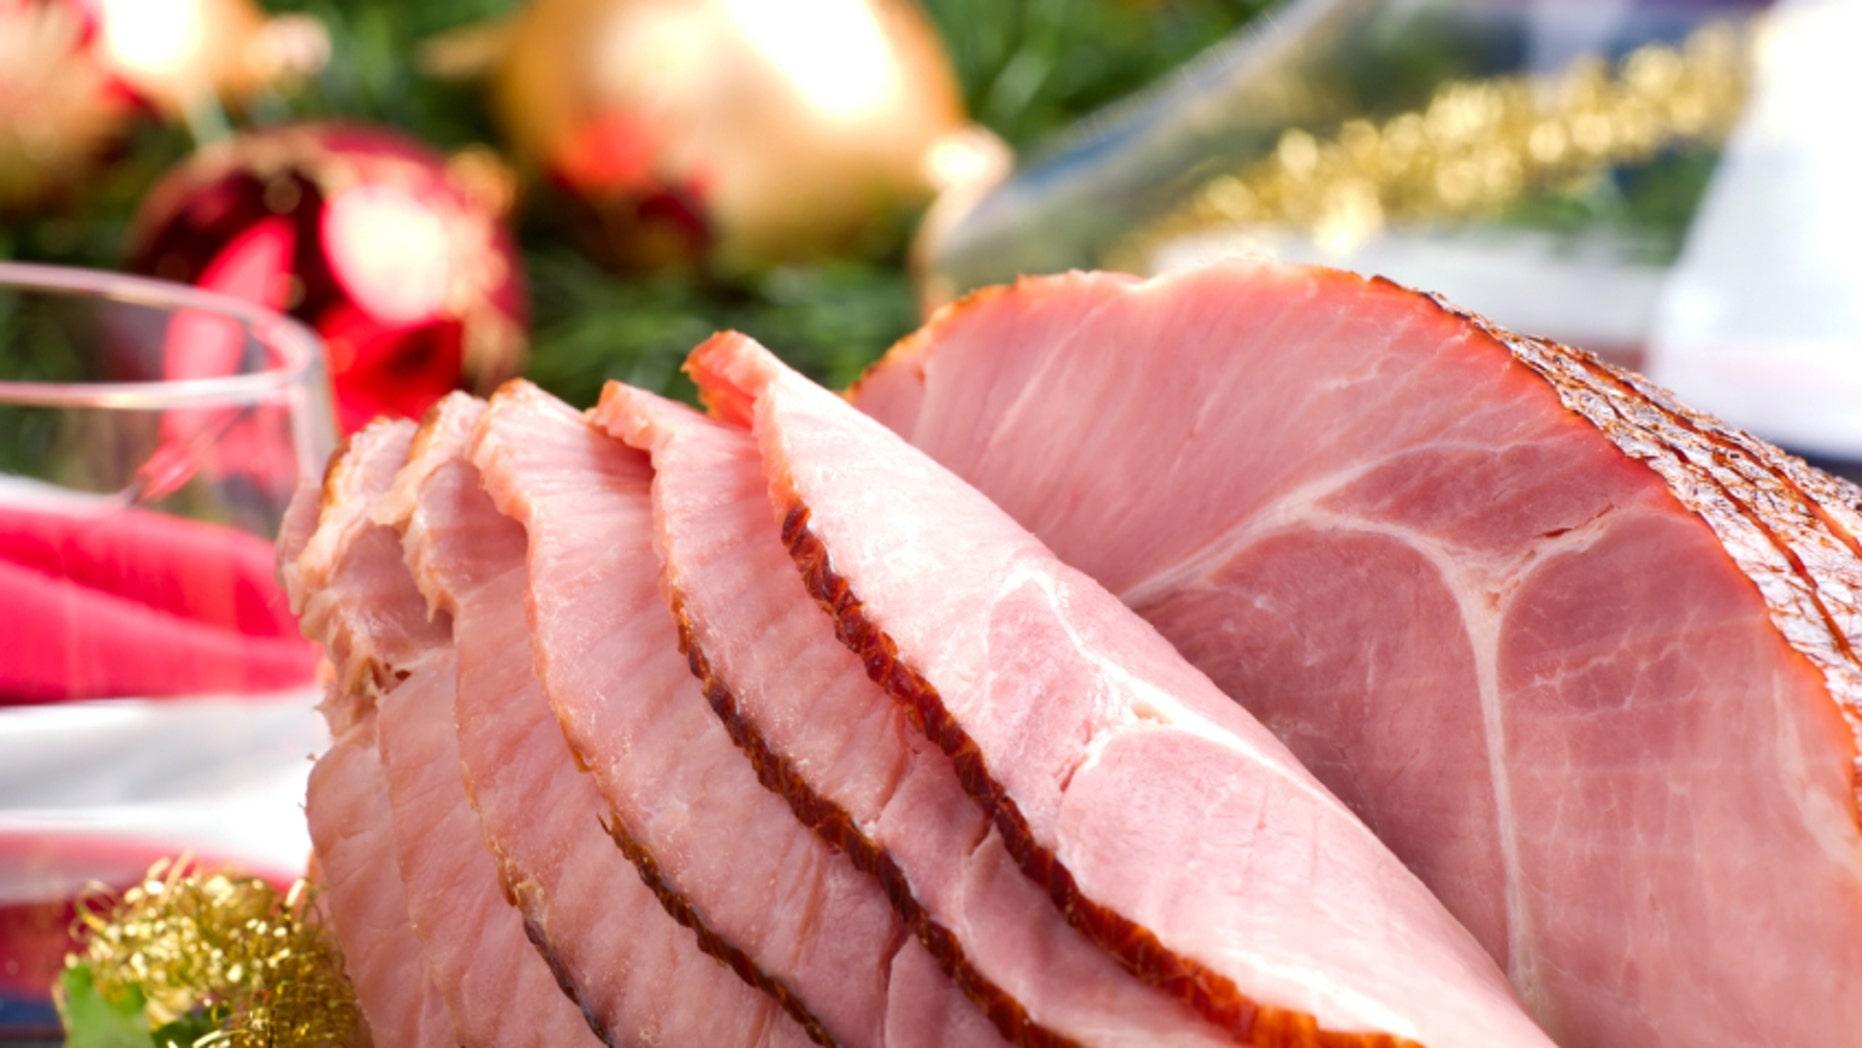 Holiday ham will be pricier this season.